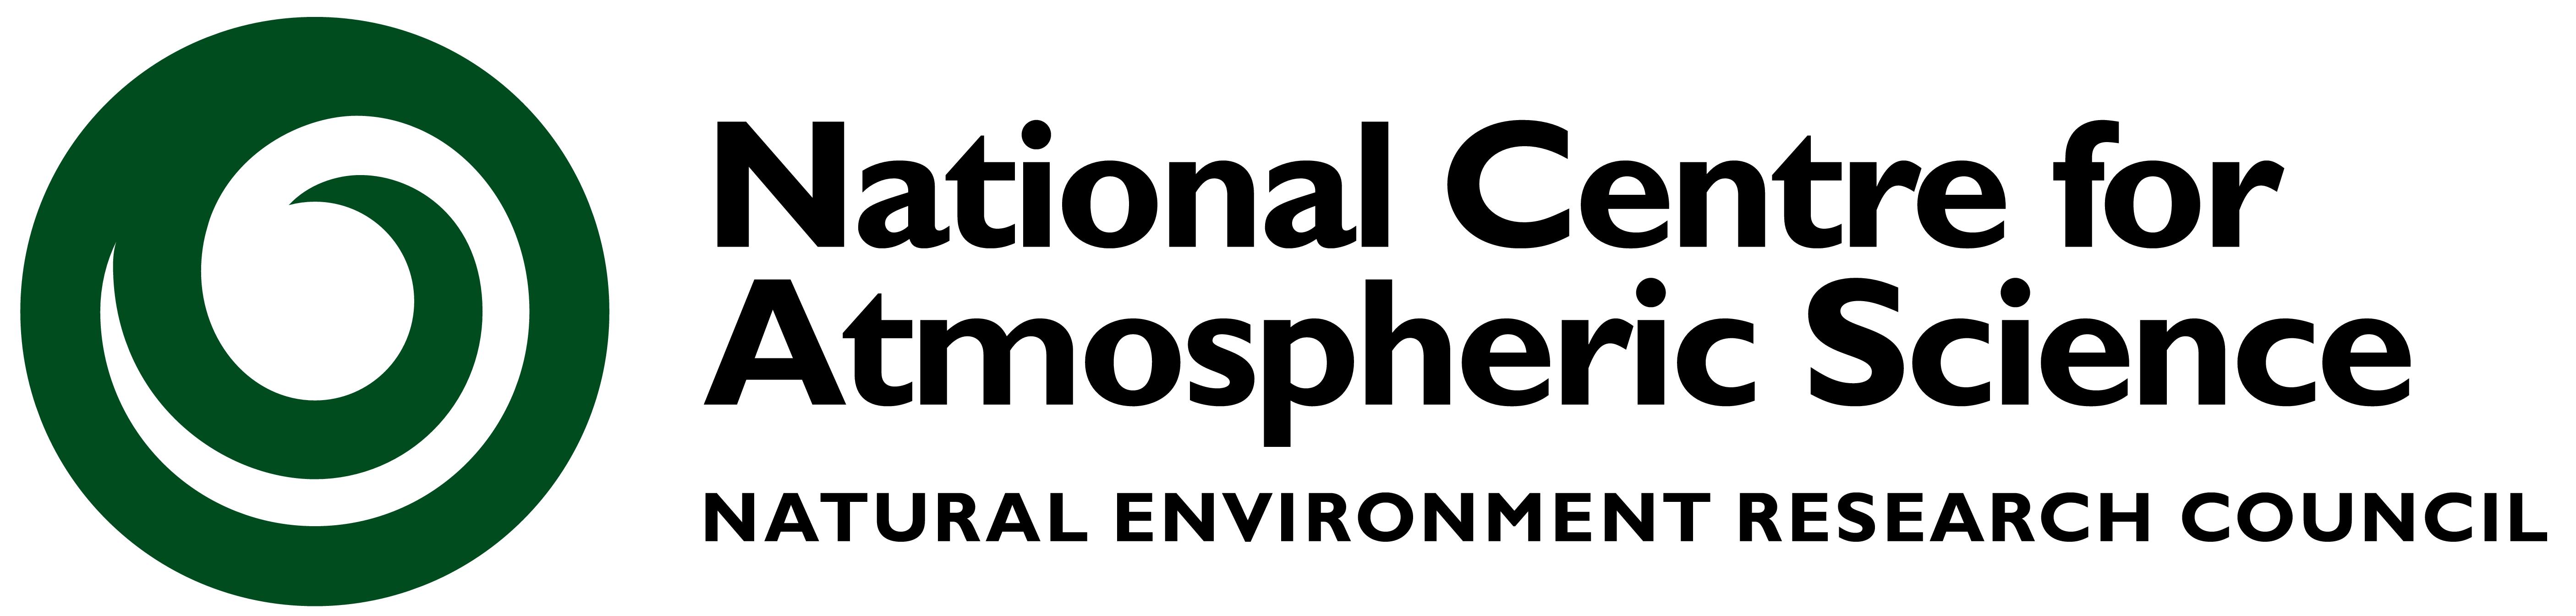 https://www.ncas.ac.uk/en/amf-menu